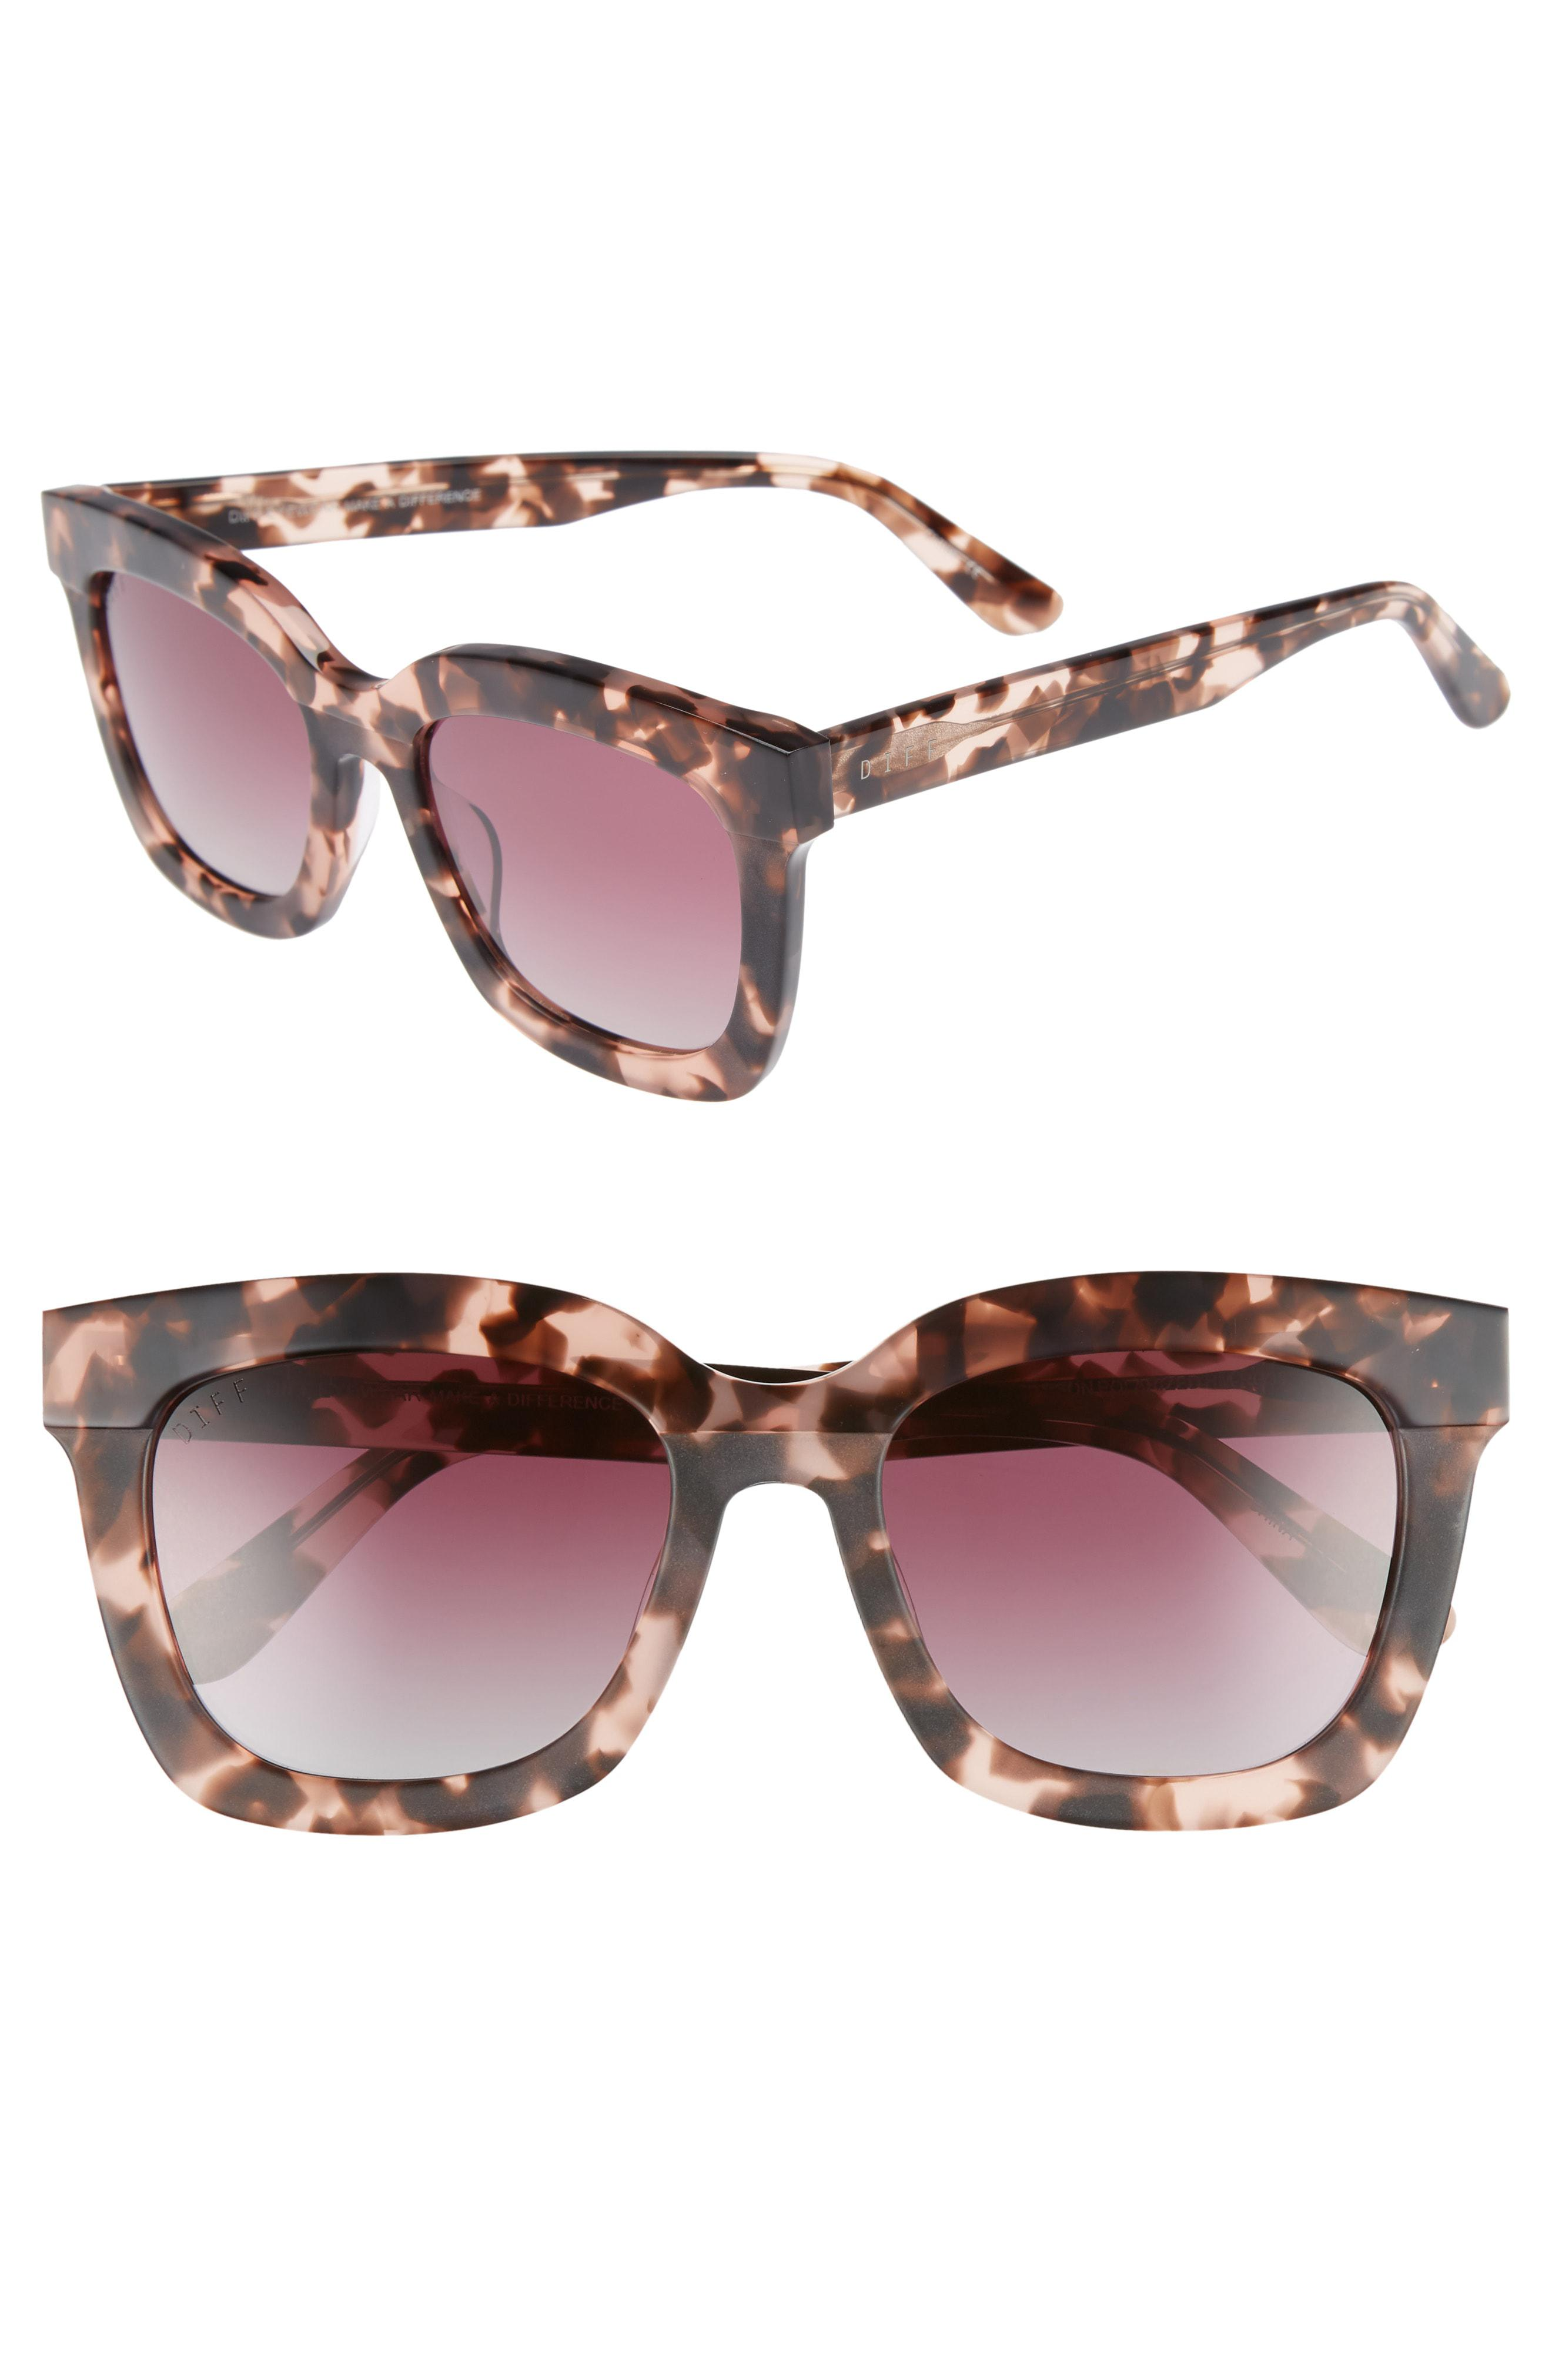 16b6b462b9 DIFF. Women s Pink Carson 53mm Polarized Square Sunglasses - Himalayan  Tortoise  Rose